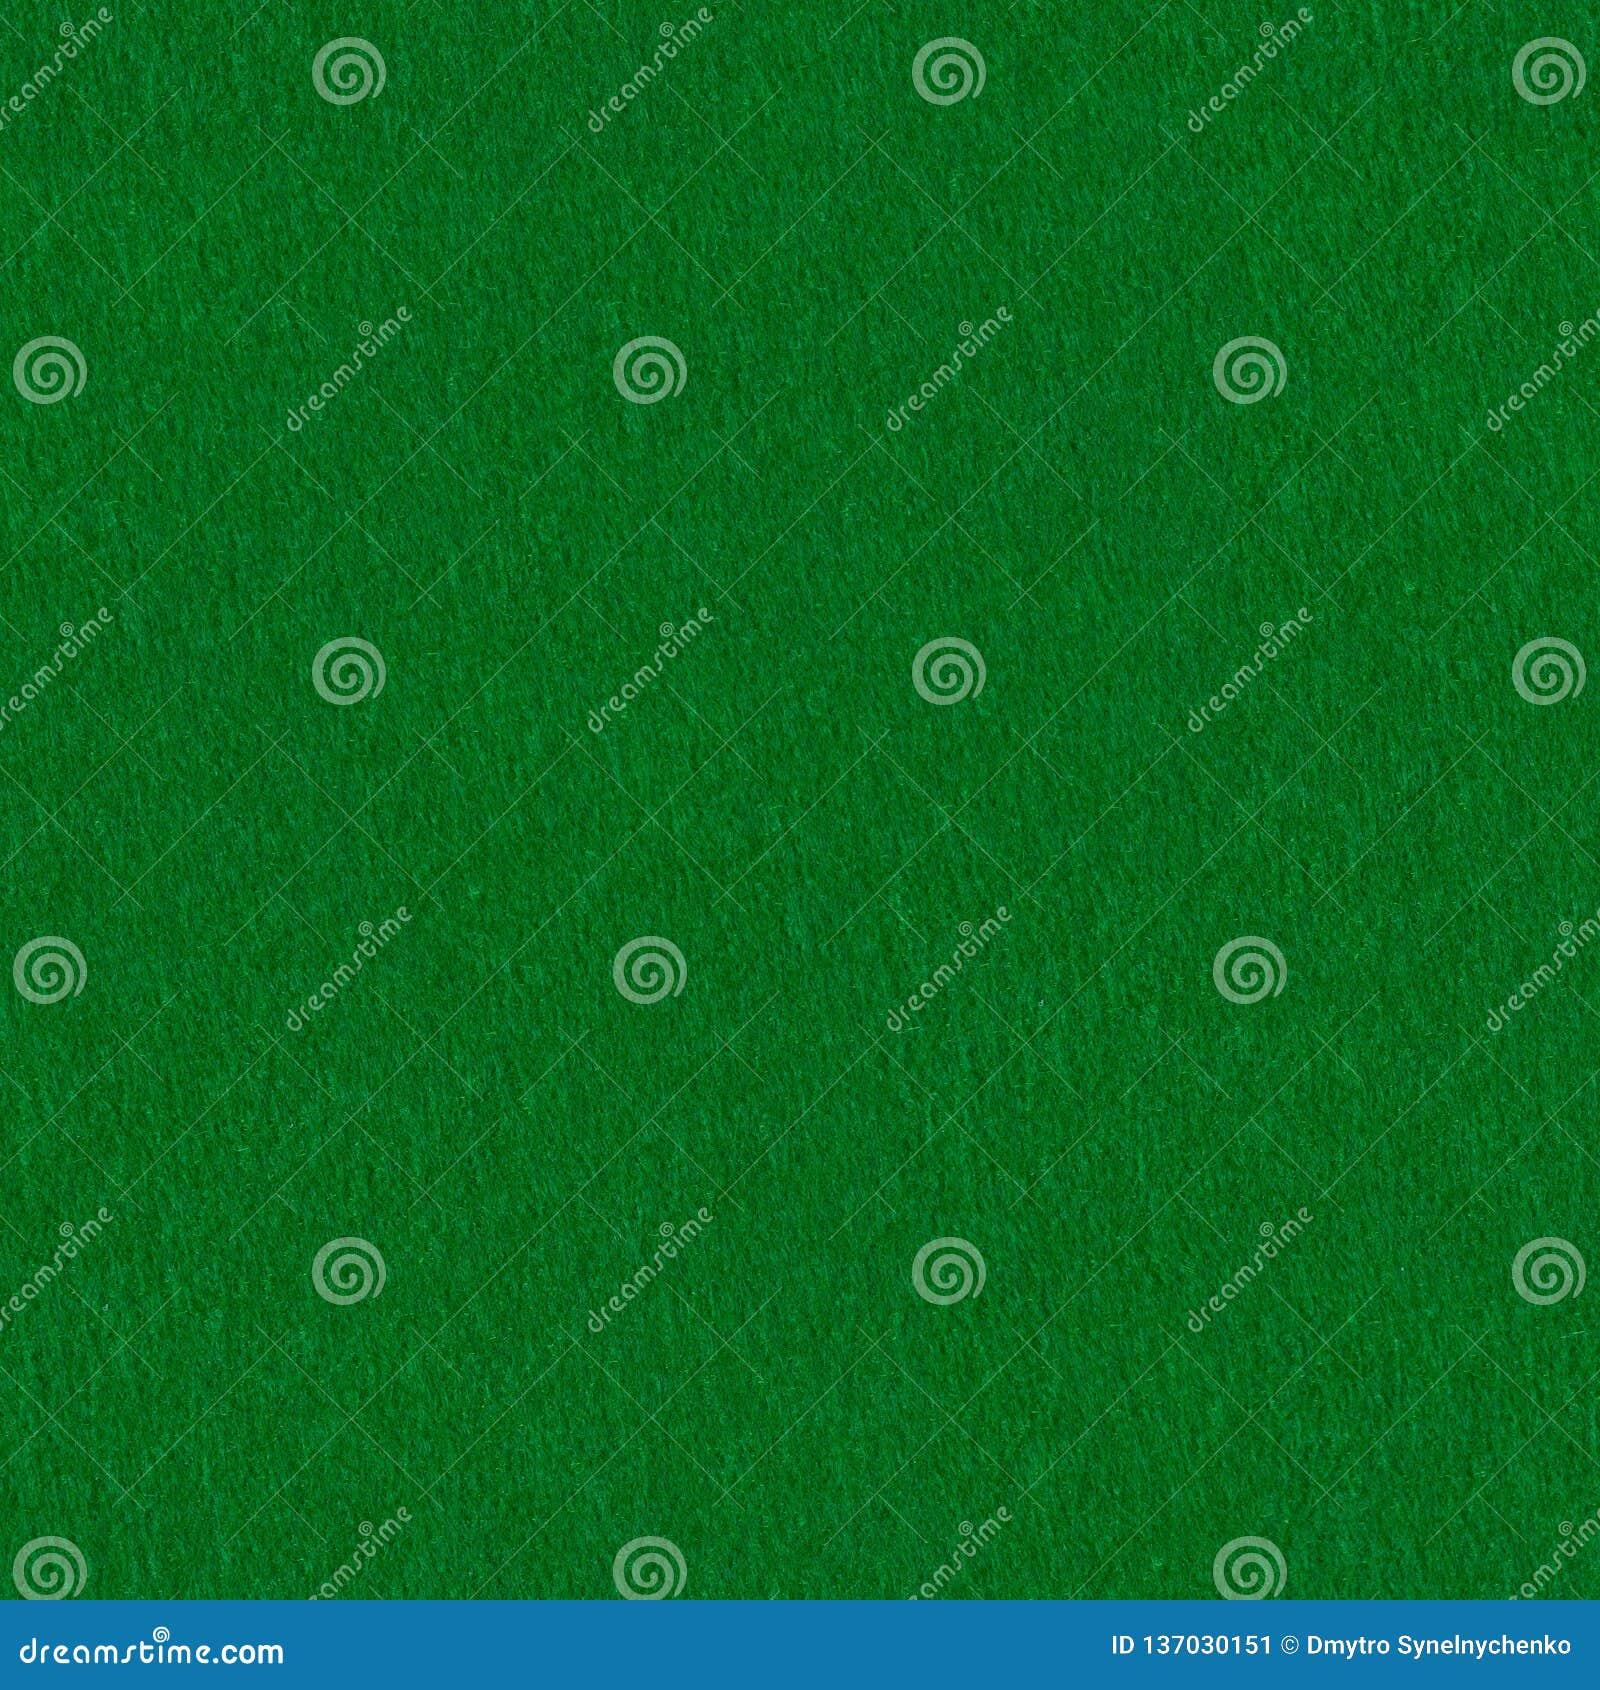 Poker Table Felt Background  Seamless Square Texture, Tile Ready